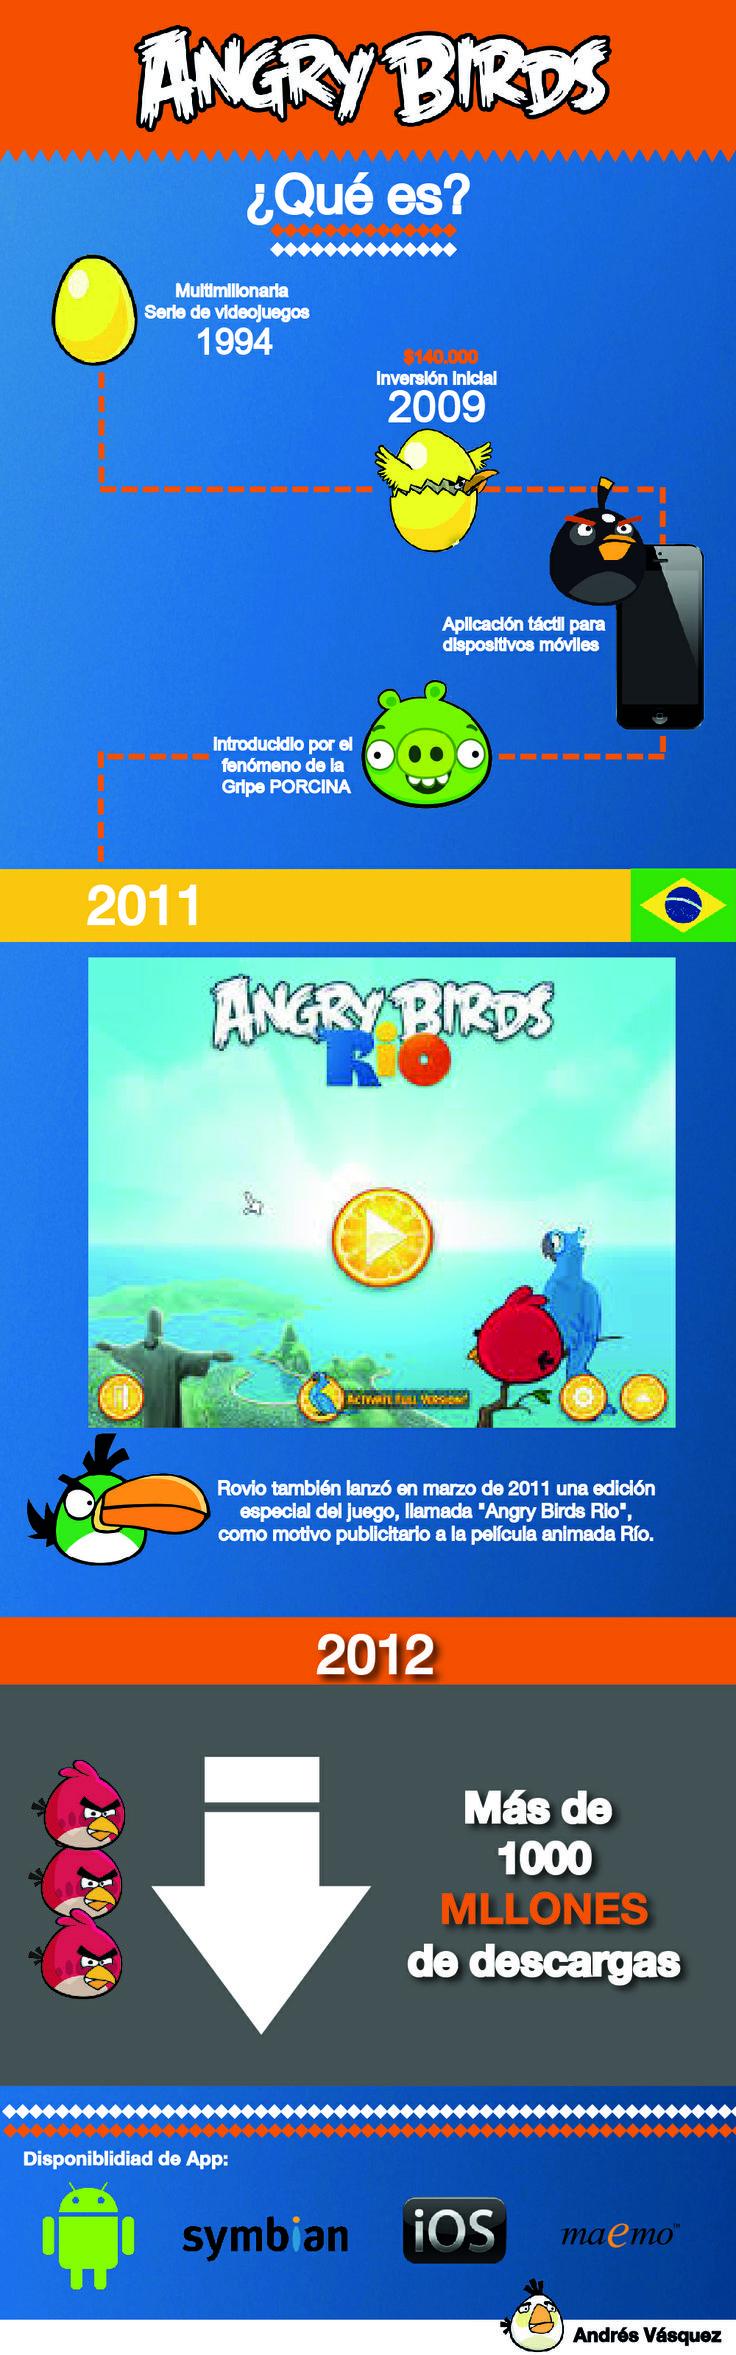 Análisis de APP AngryBirds. By Andrés Vásquez